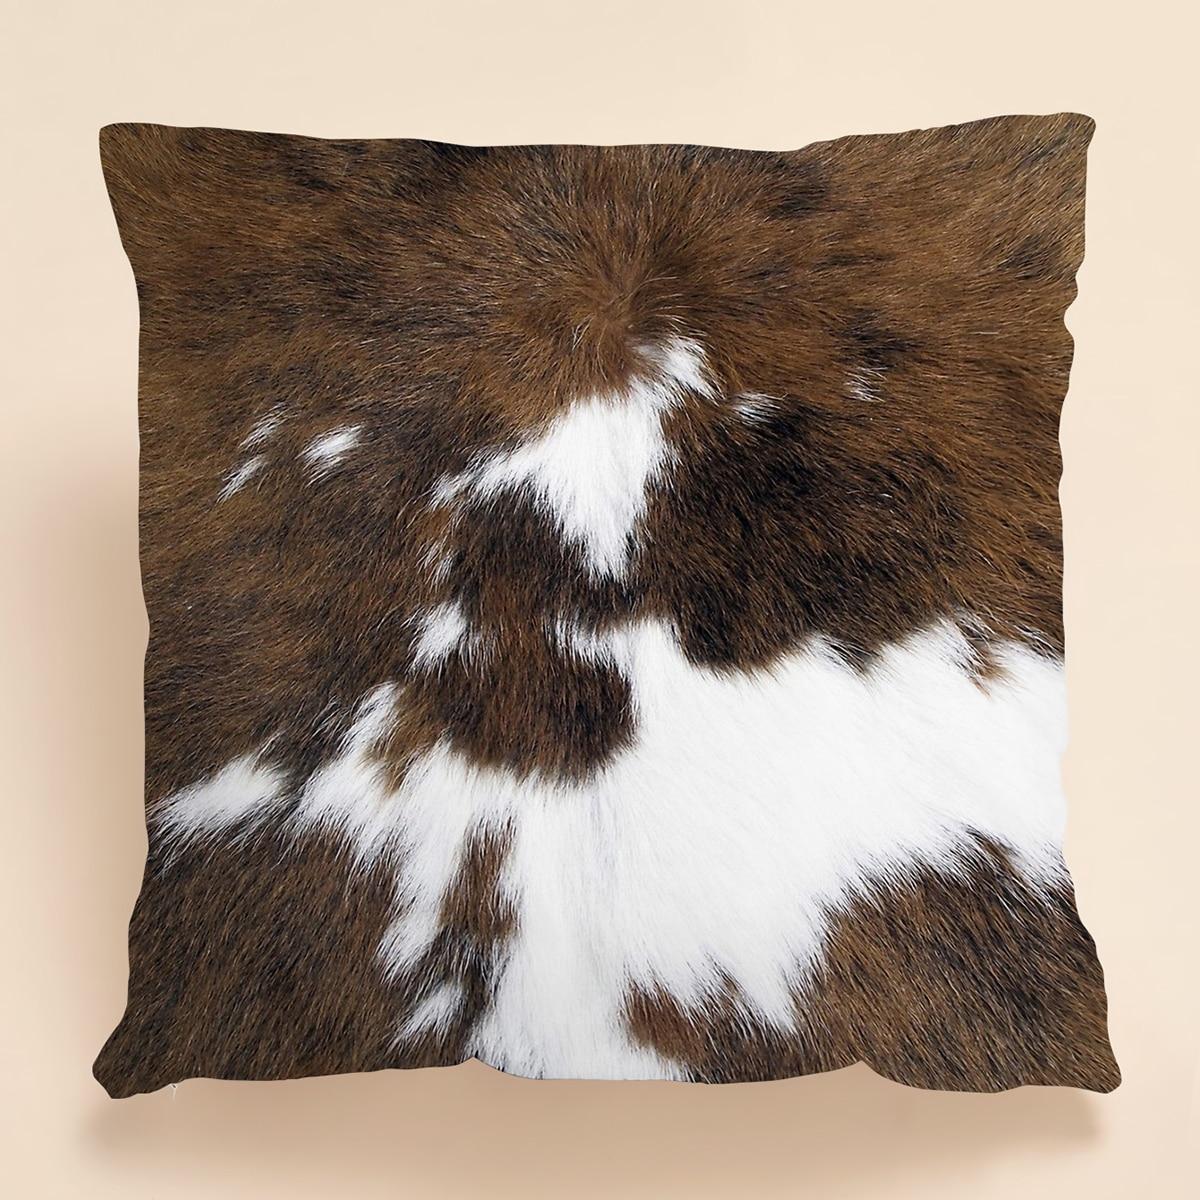 Kissenbezug mit Pelz Muster ohne Füllstoff